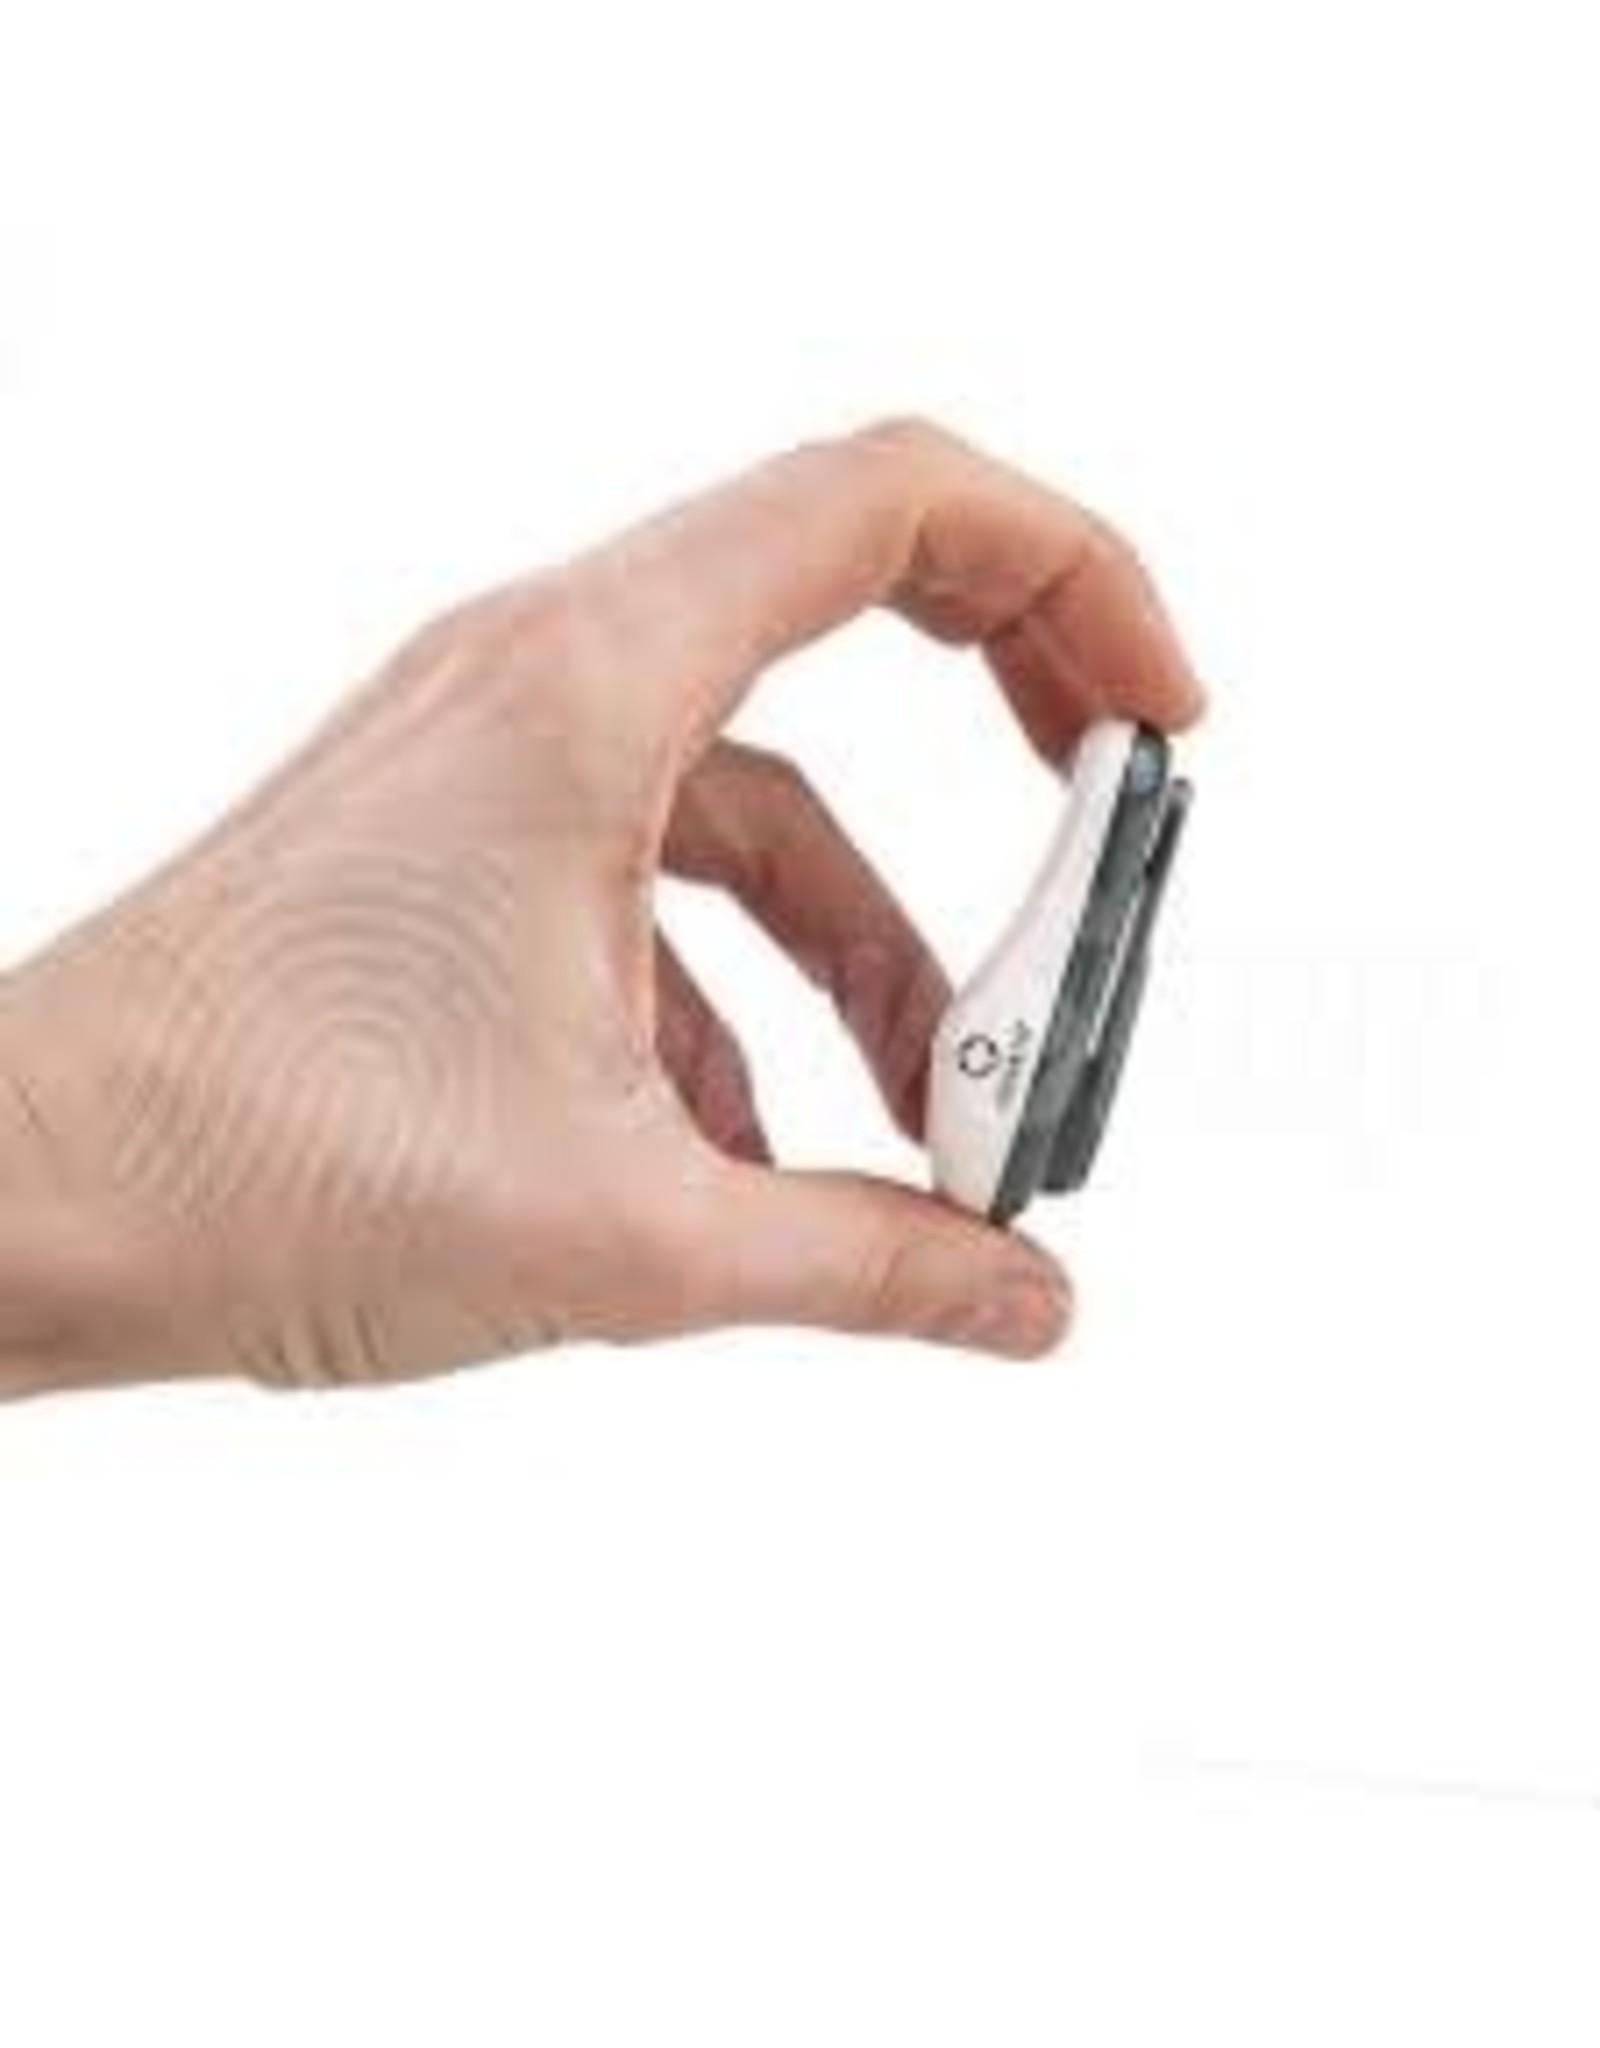 Miteless Portable